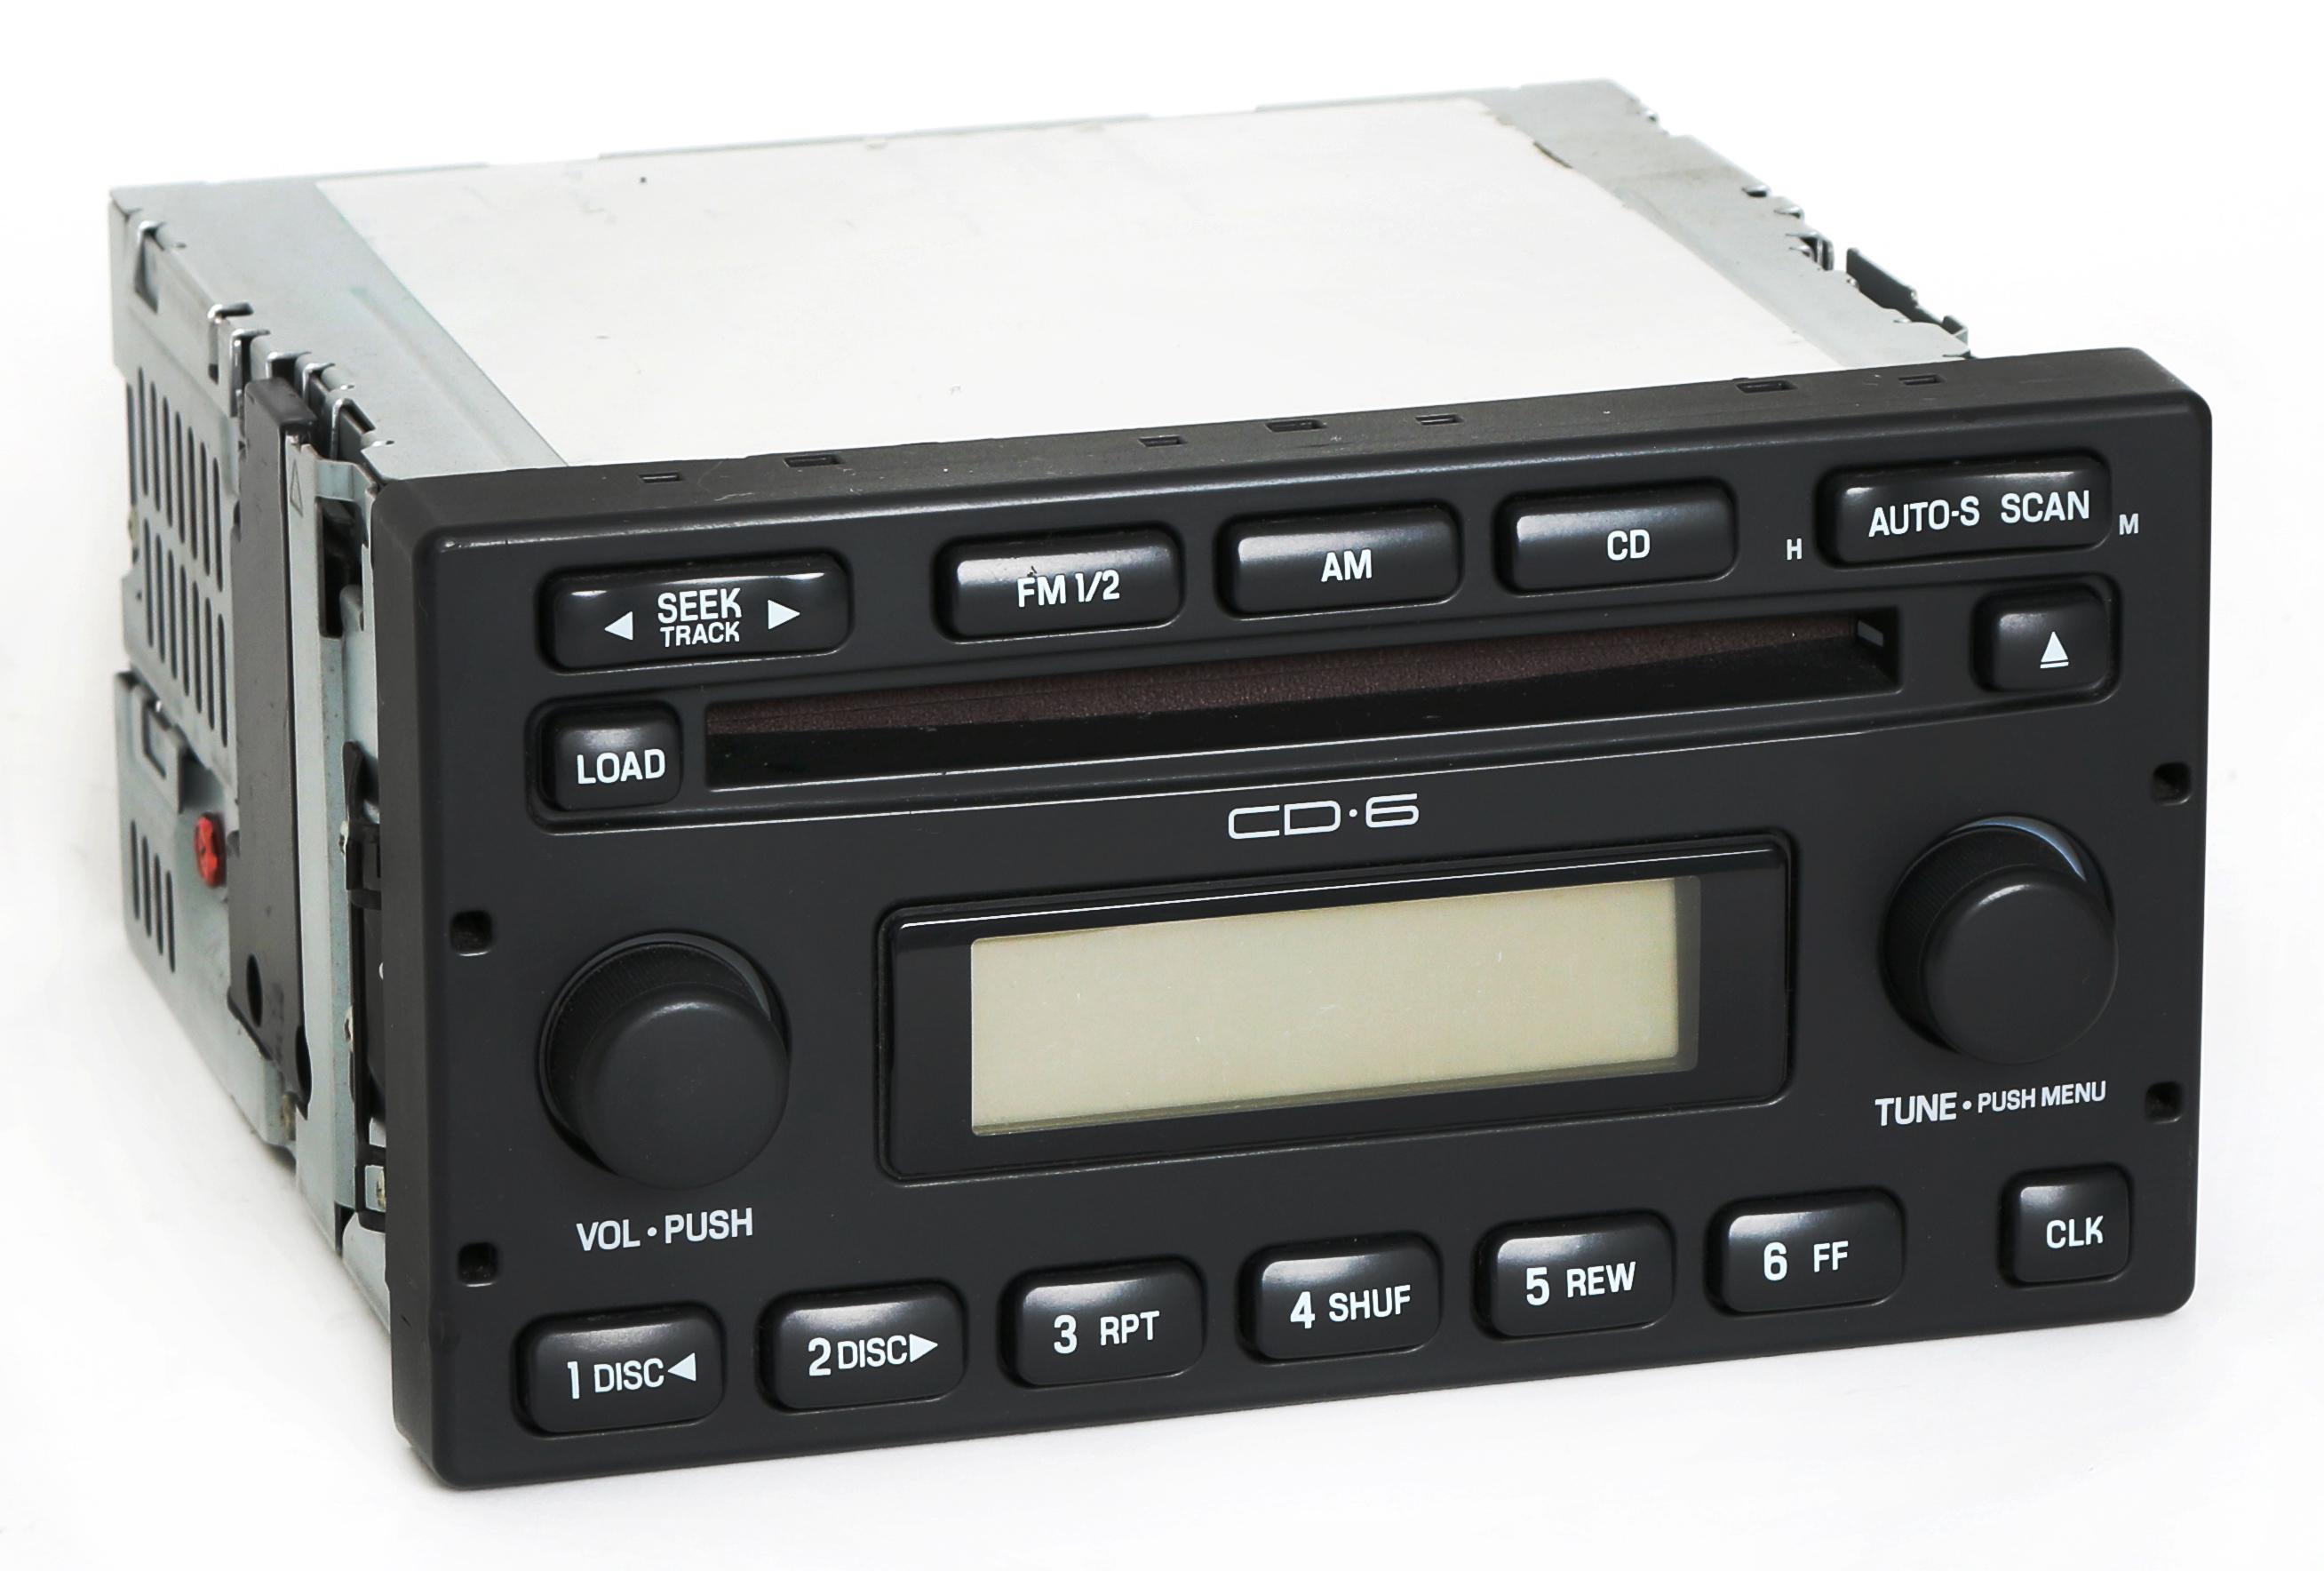 Ford Escape Mercury Mariner 2005-2007 Radio AM FM 6 Disc CD Part  5L8T-18C815-EC - 1 Factory Radio